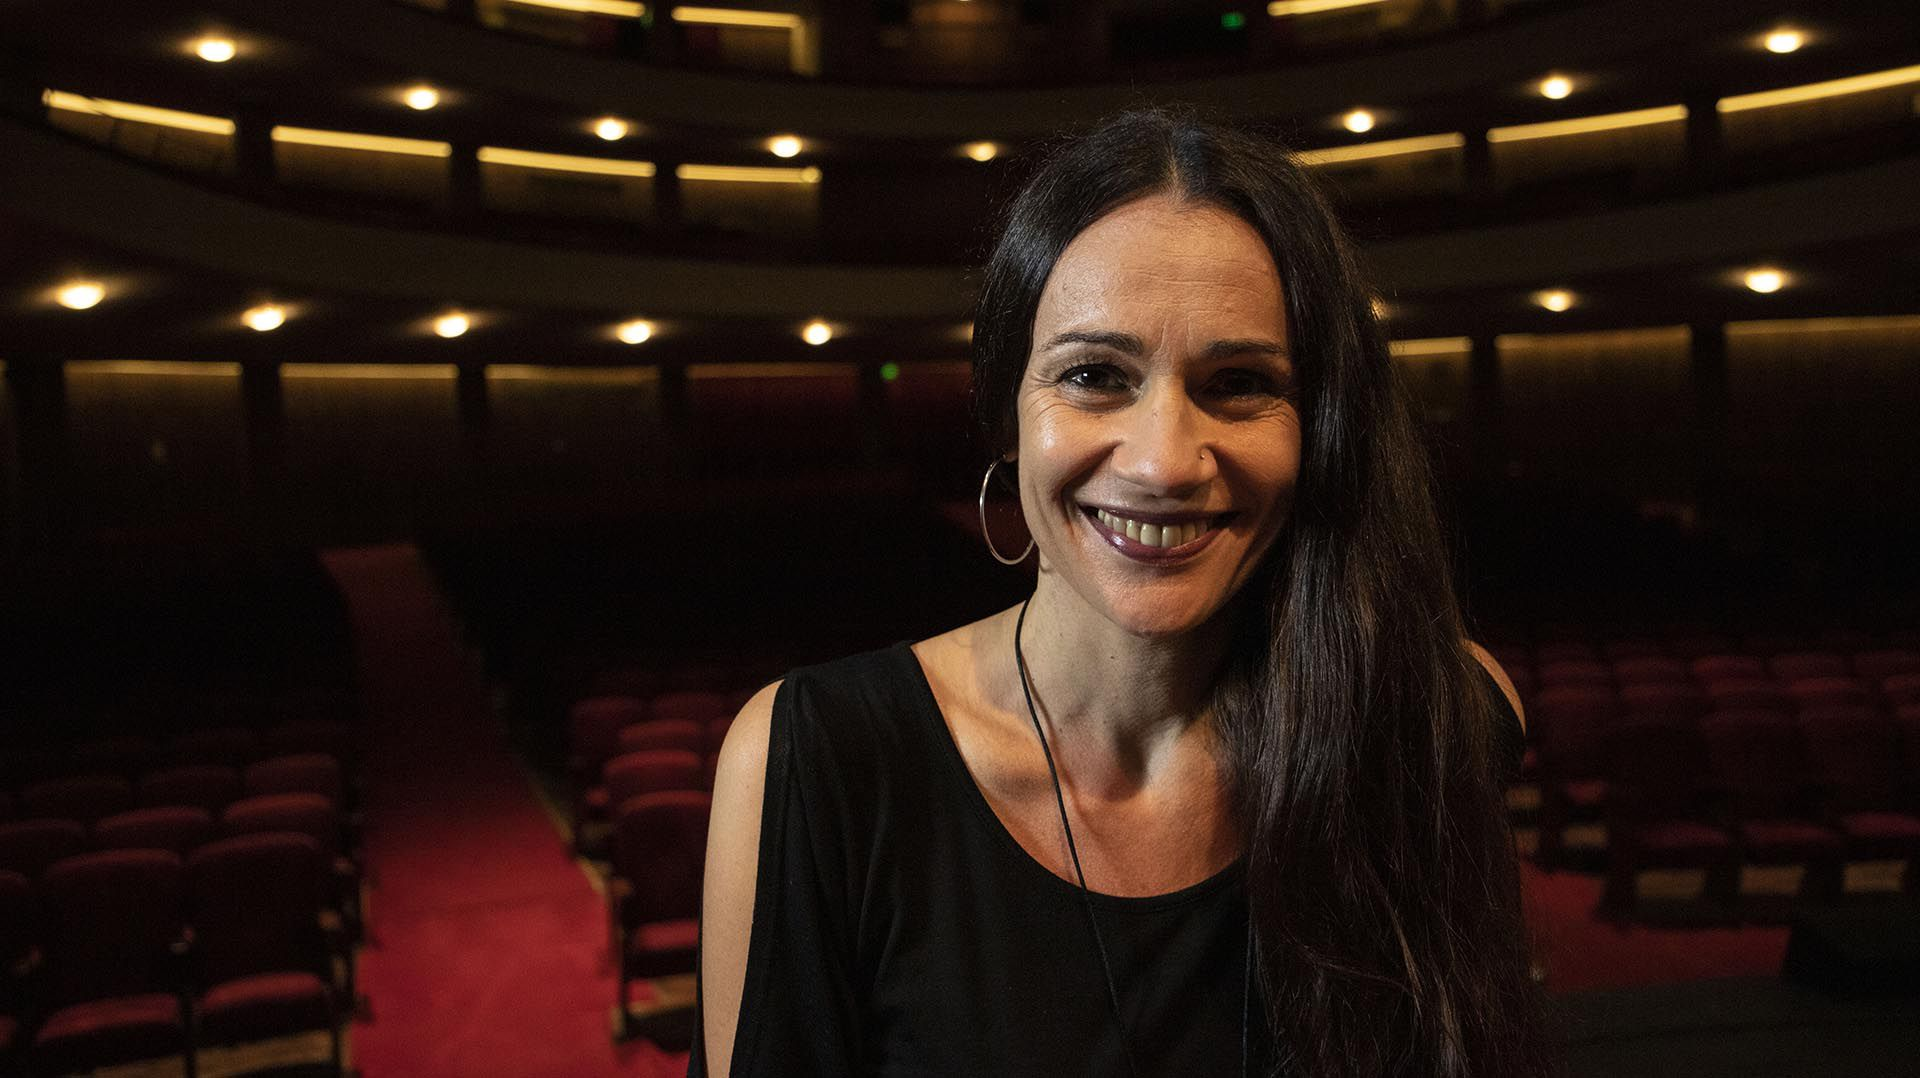 Elisabetta Riva, directora del Teatro Coliseo (Lihue Althabe)